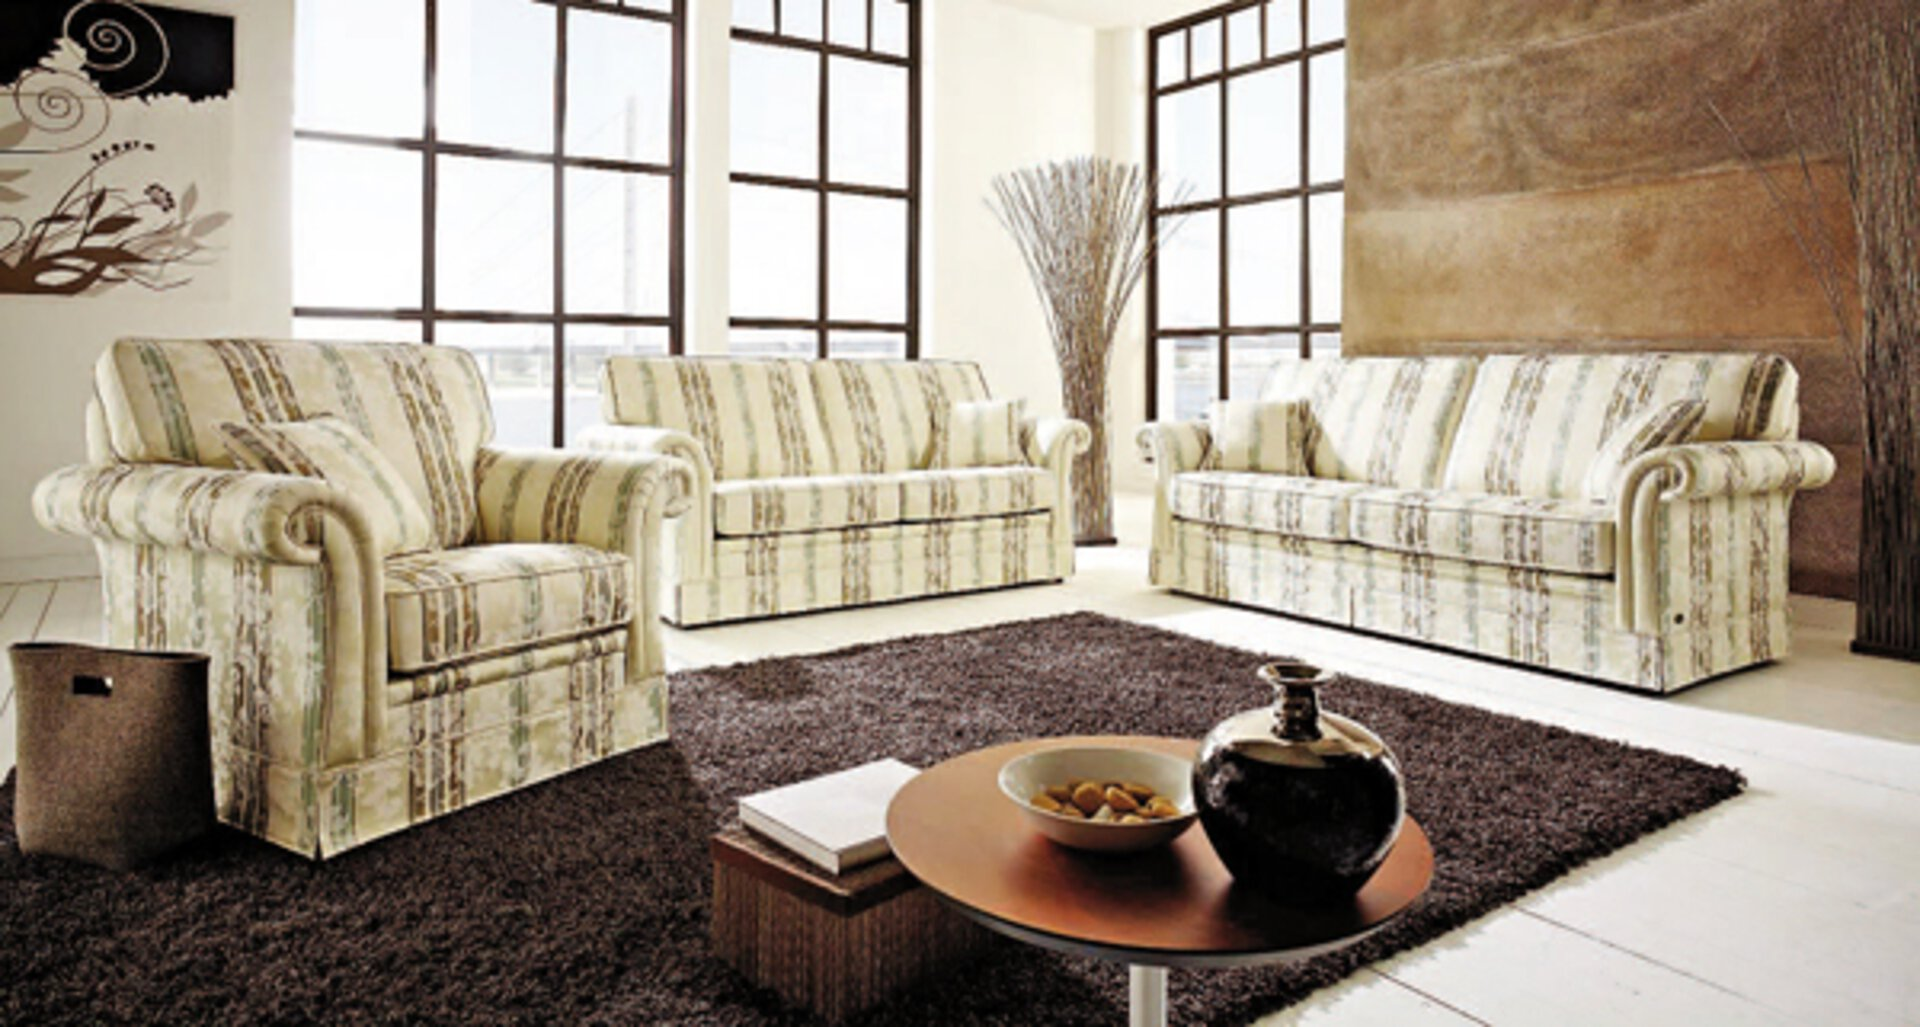 Sofa 2-Sitzer IMPERIAL Schröno Textil 90 x 88 x 153 cm